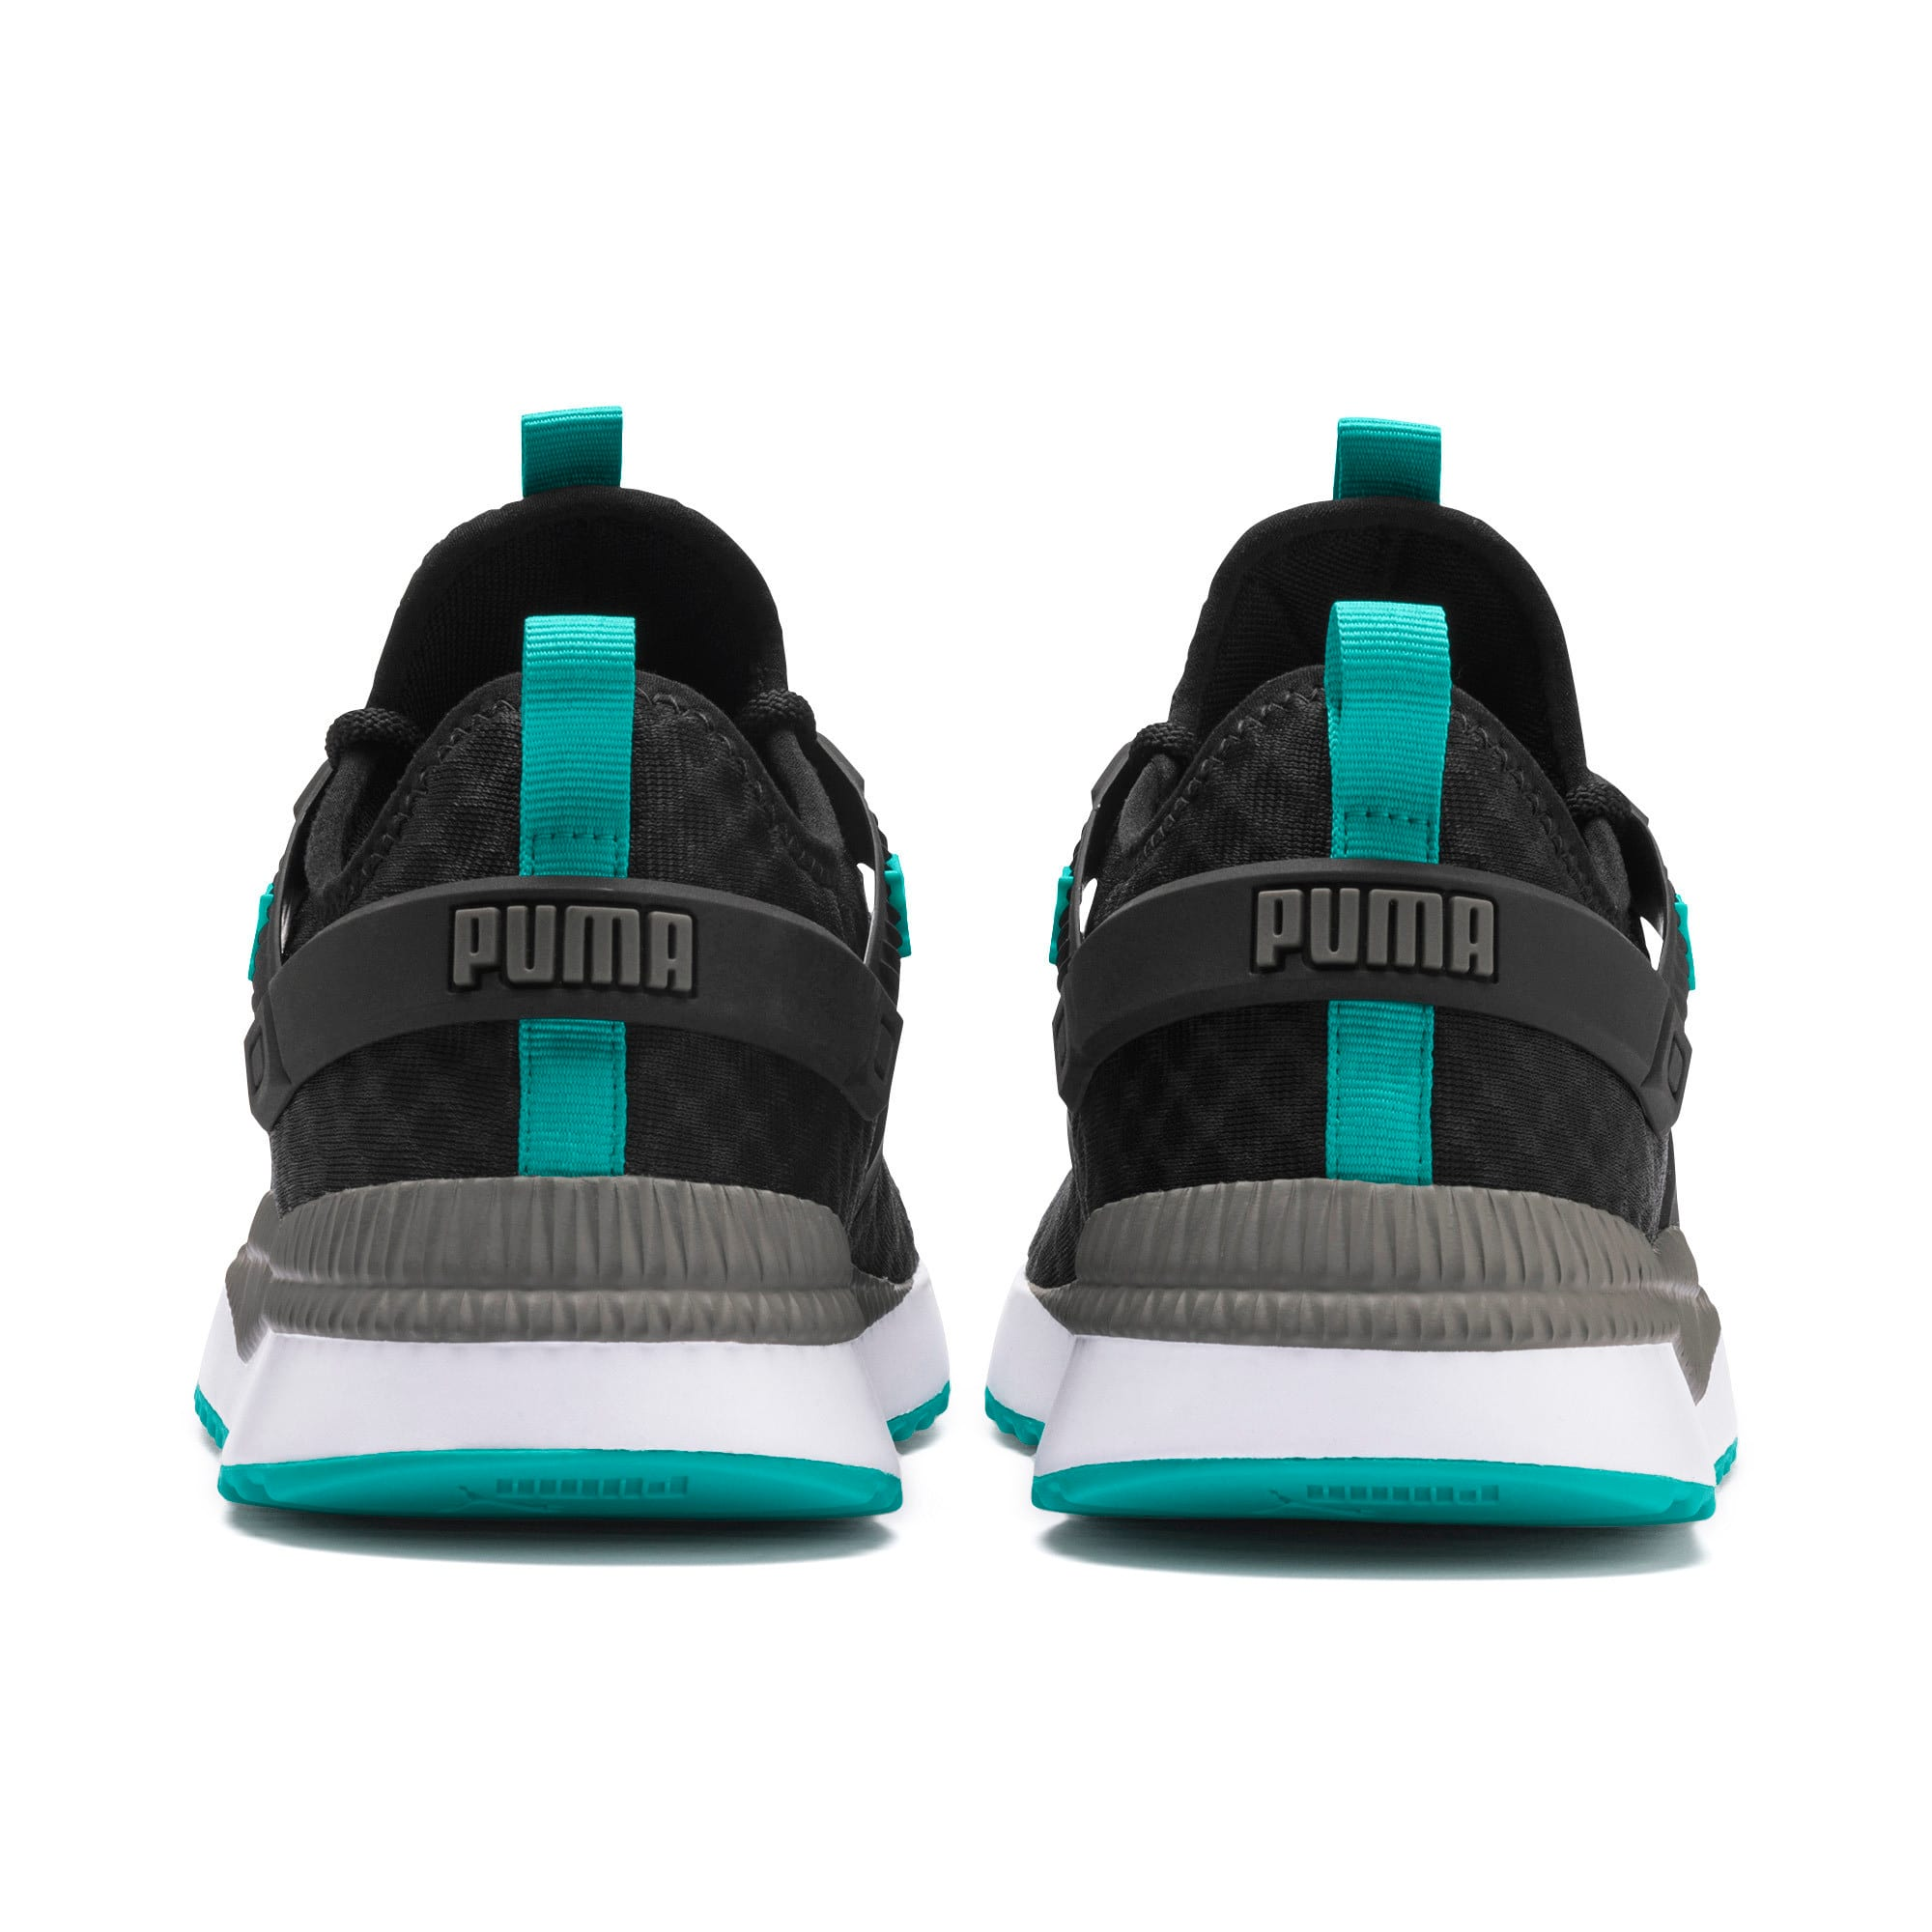 Thumbnail 4 of Pacer Next Excel Laufschuhe, Puma Black-Blue Turquoise, medium